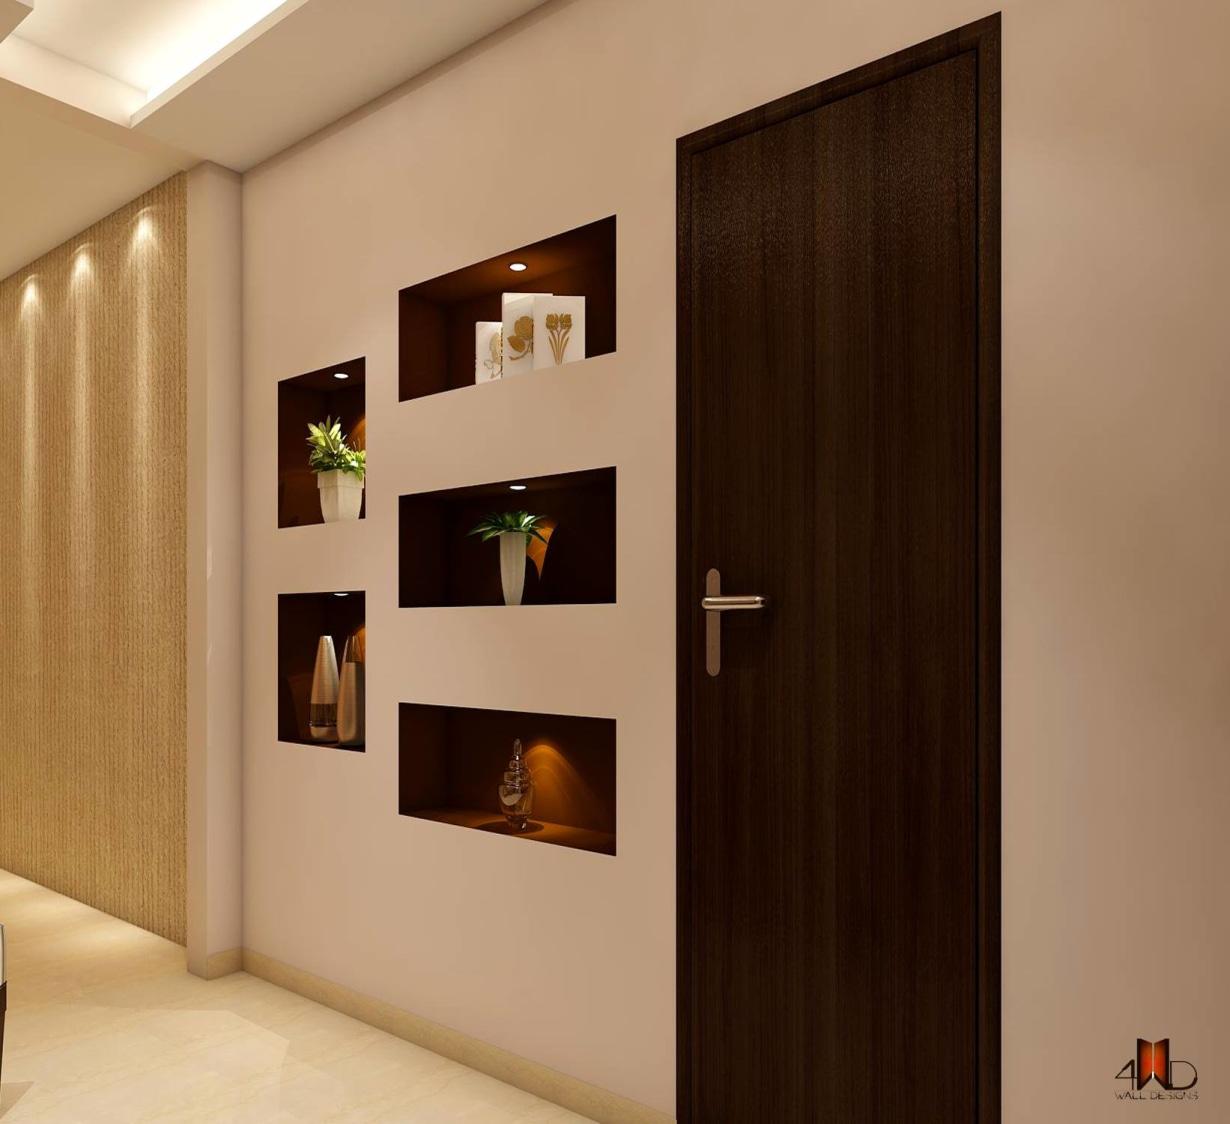 Coffee Concoction by Wall Designs Contemporary | Interior Design Photos & Ideas